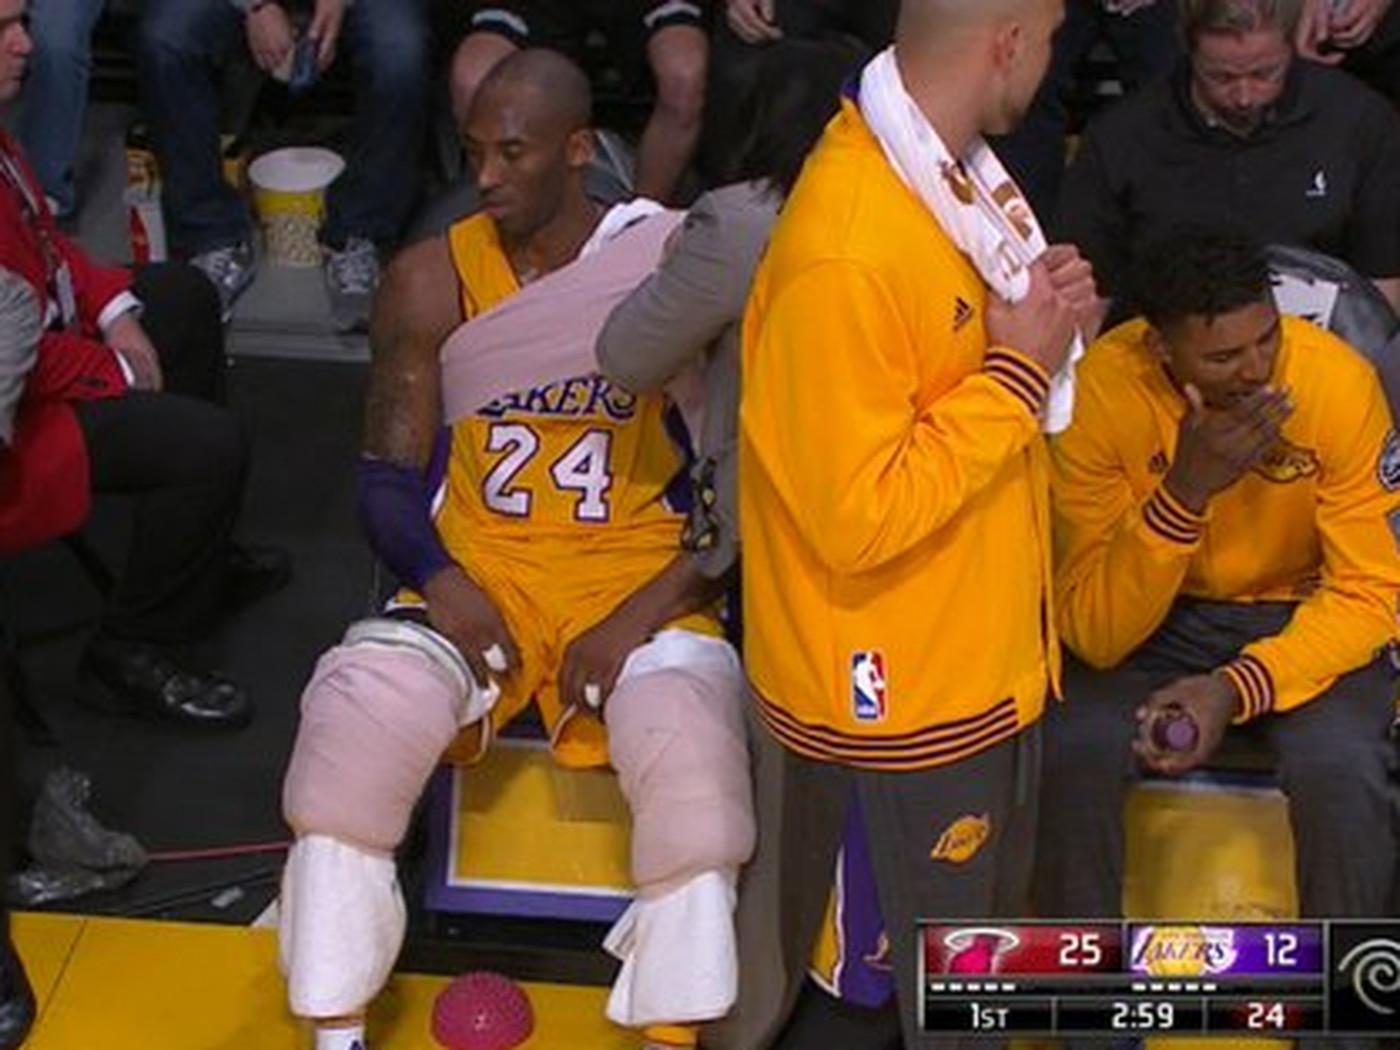 d2eb2917dd2 Kobe Bryant needs so many ice packs and wraps he looks like the dang  Michelin Man - SBNation.com